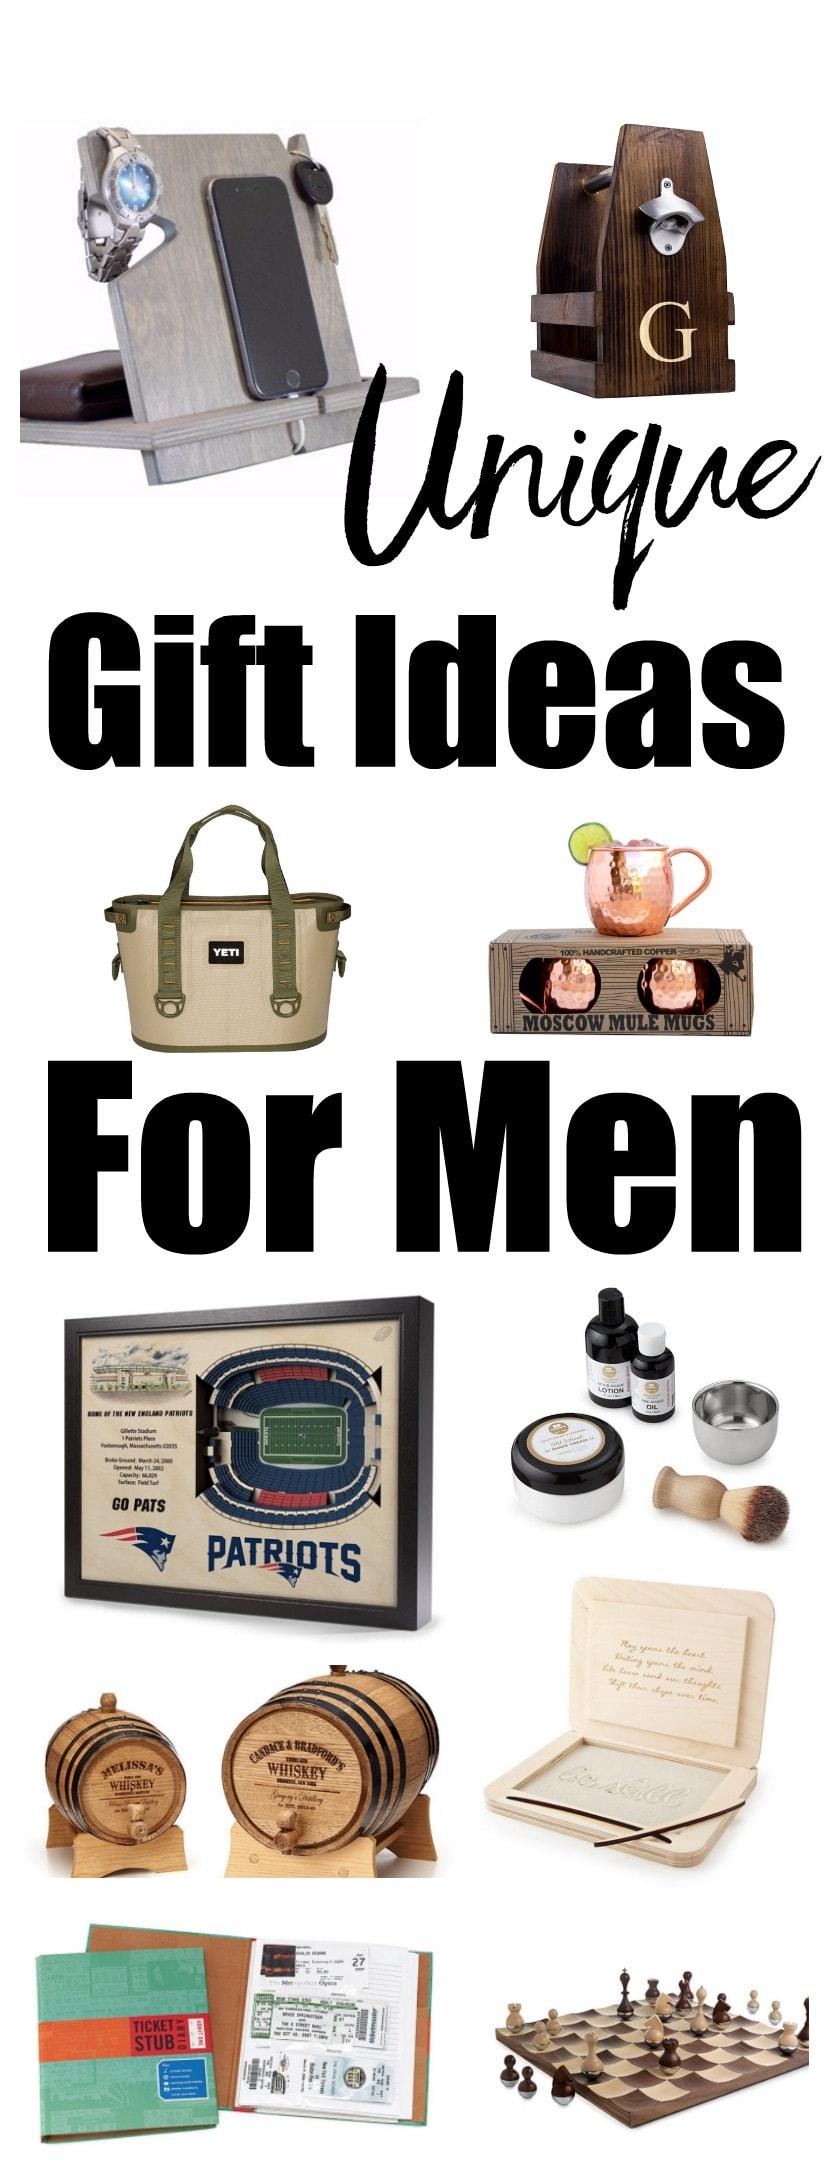 Unique Gift Ideas for Men! Christmas gift ideas for men